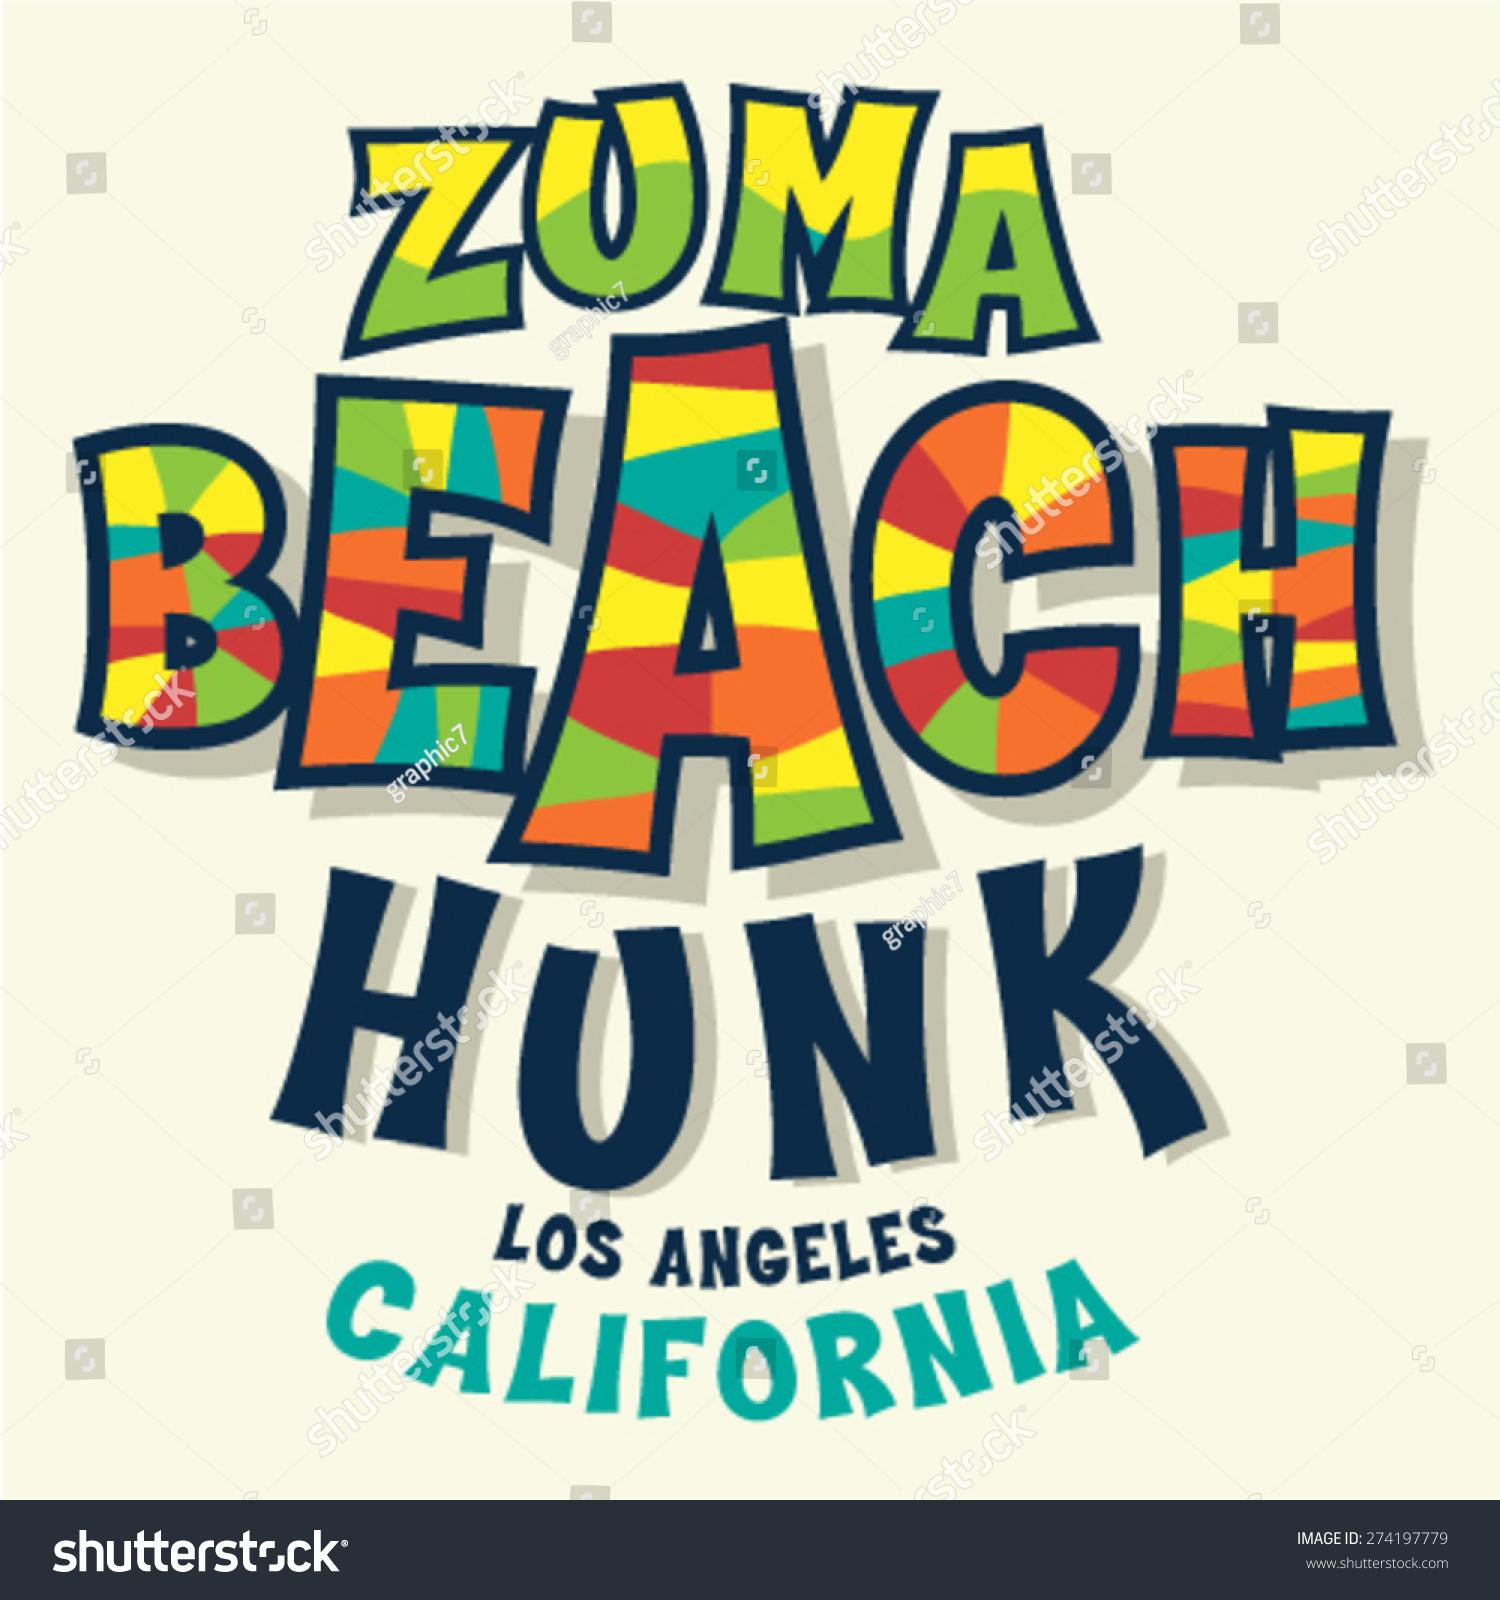 T shirt design vector - Zuma Beach California T Shirt Design Vector Design